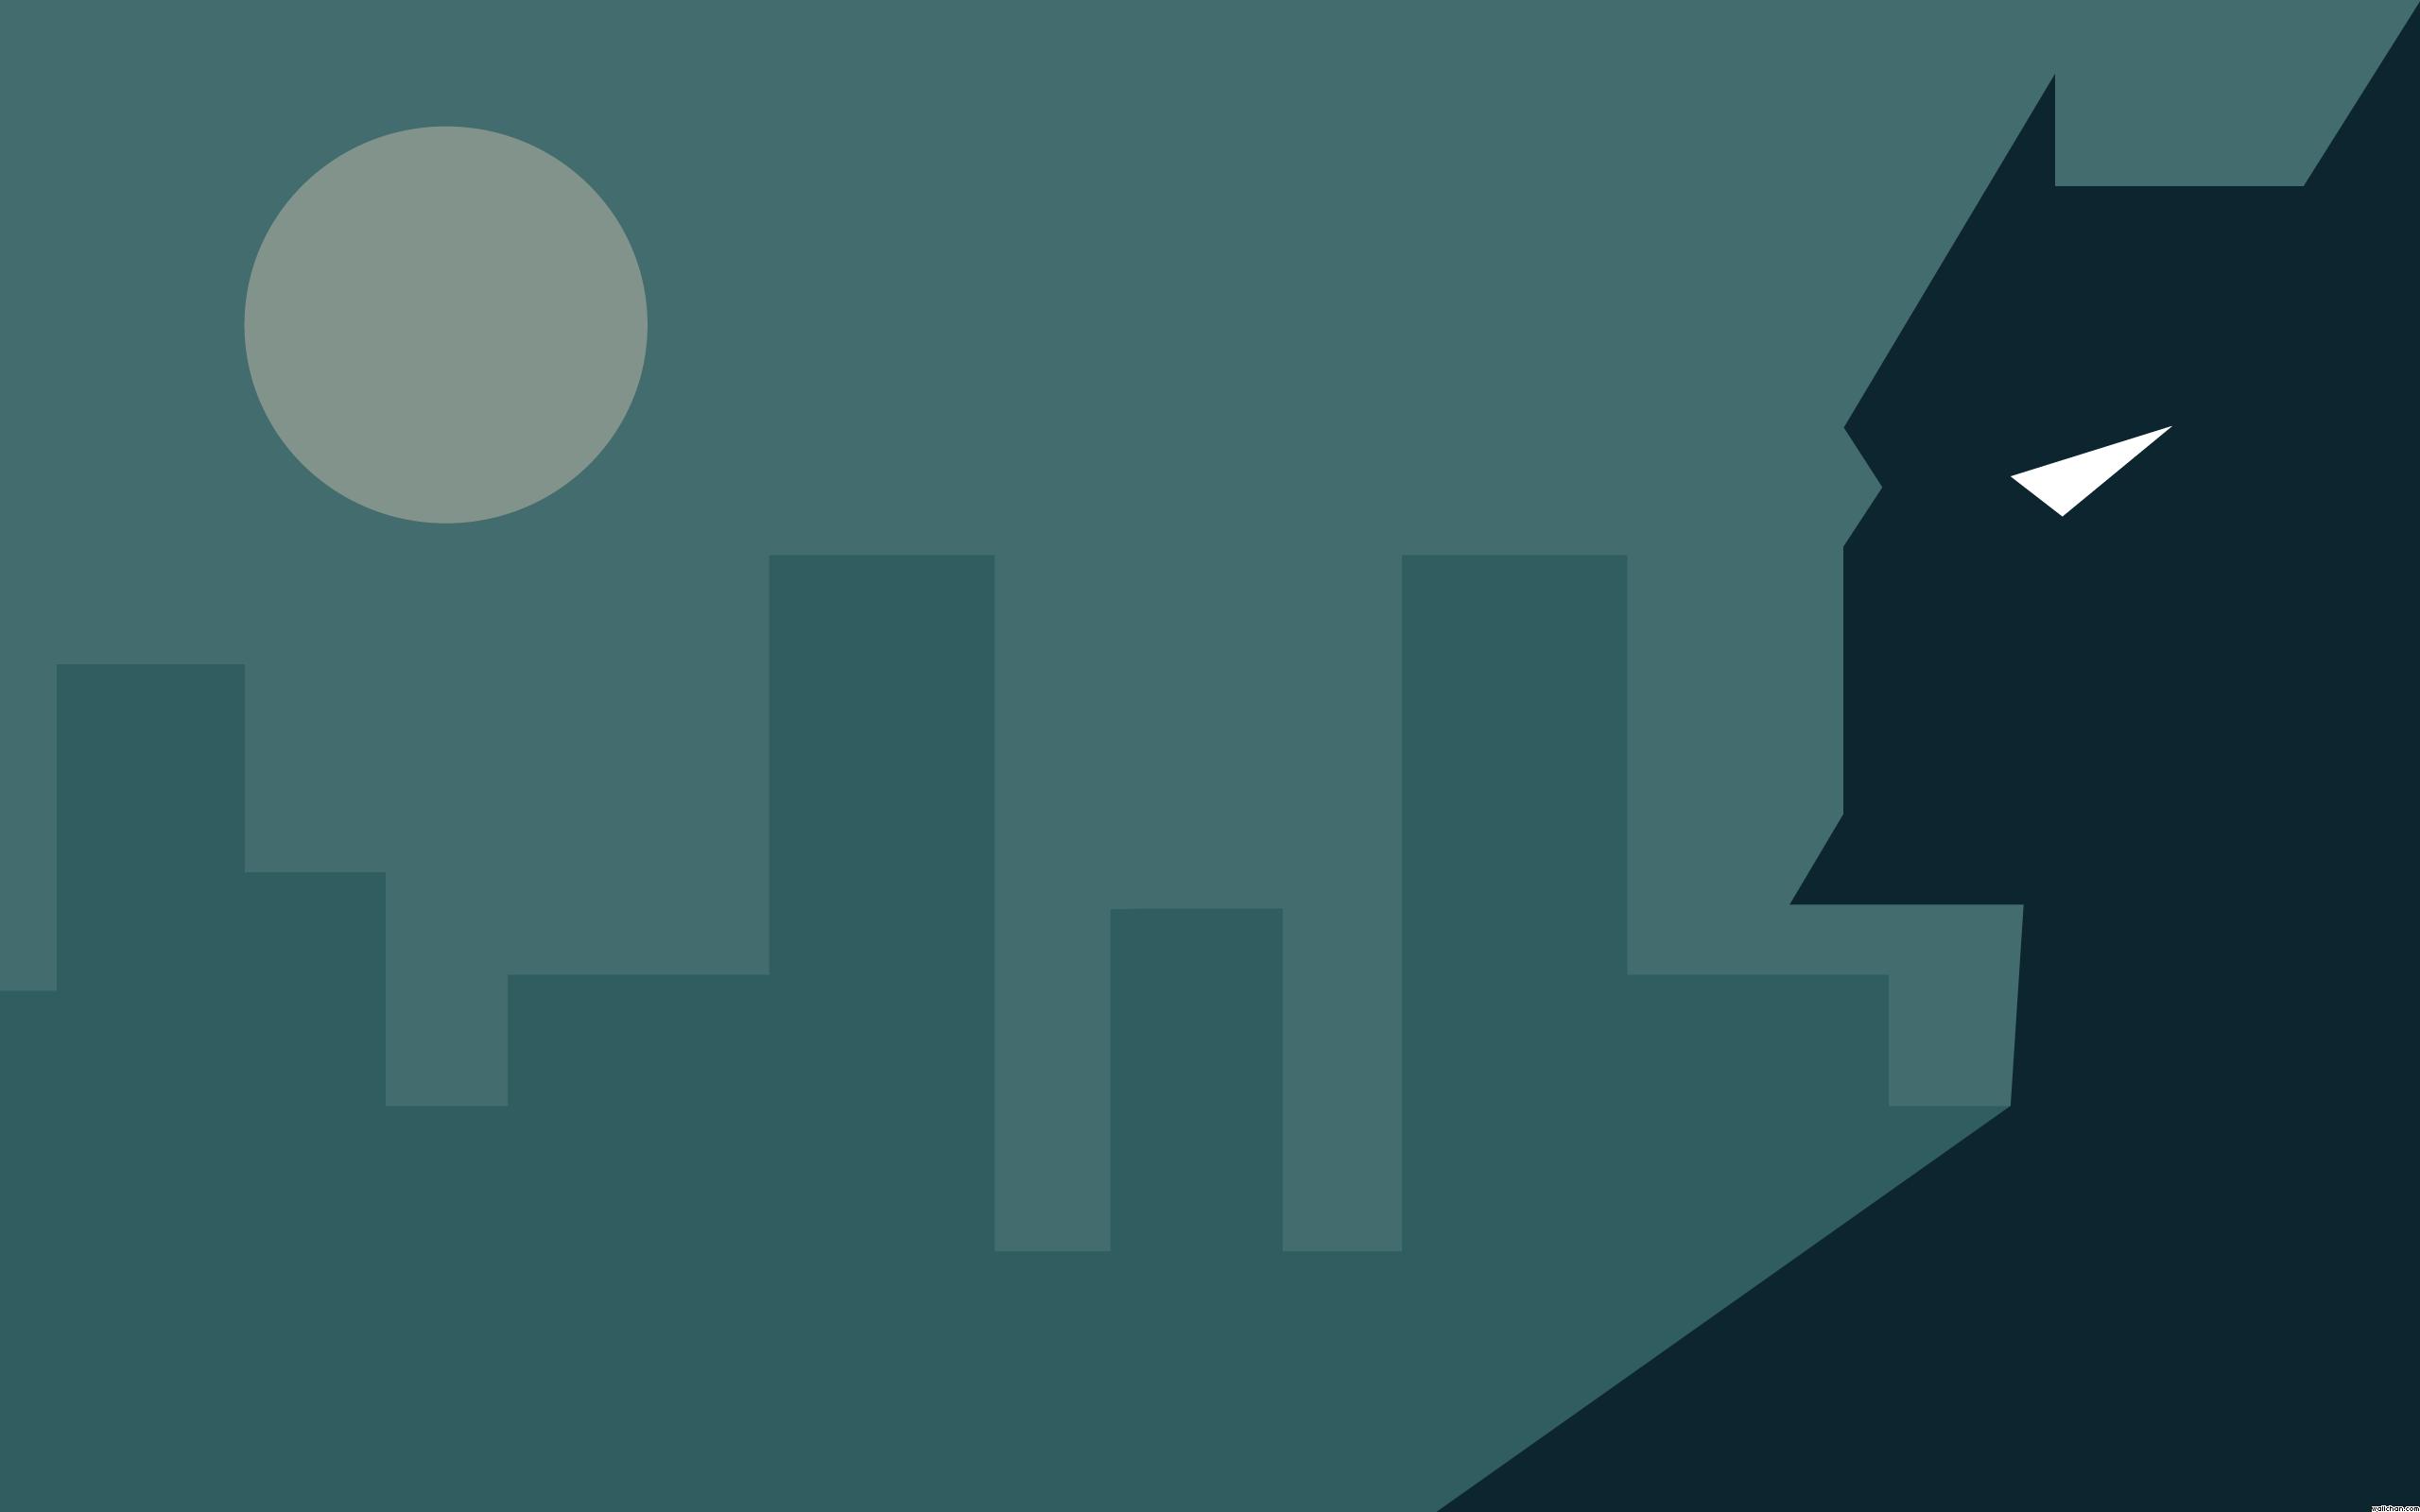 Wallpaper Quotes For Computer Batman Backgrounds New Free Download Pixelstalk Net